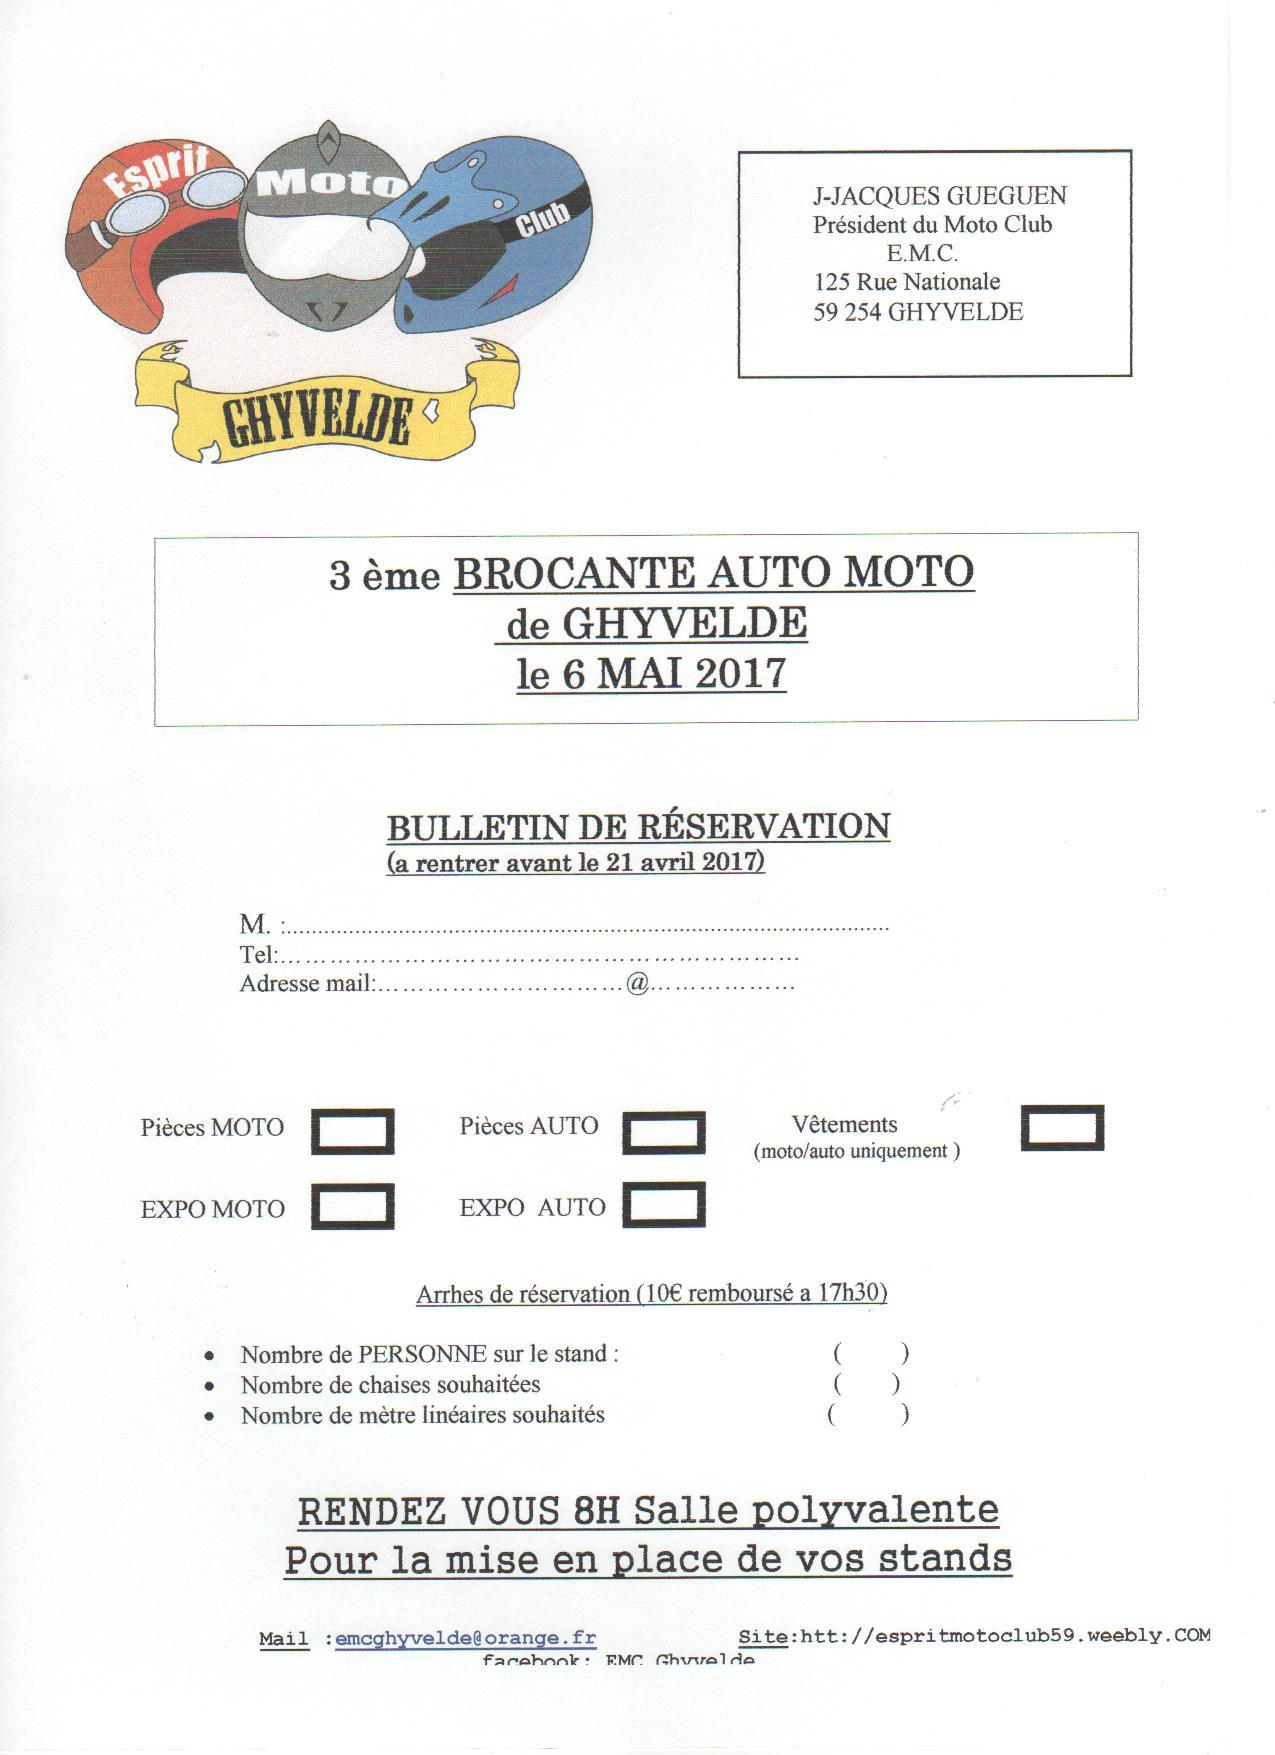 Bulletin d'inscription broc 2017 vielle moto 001.jpg